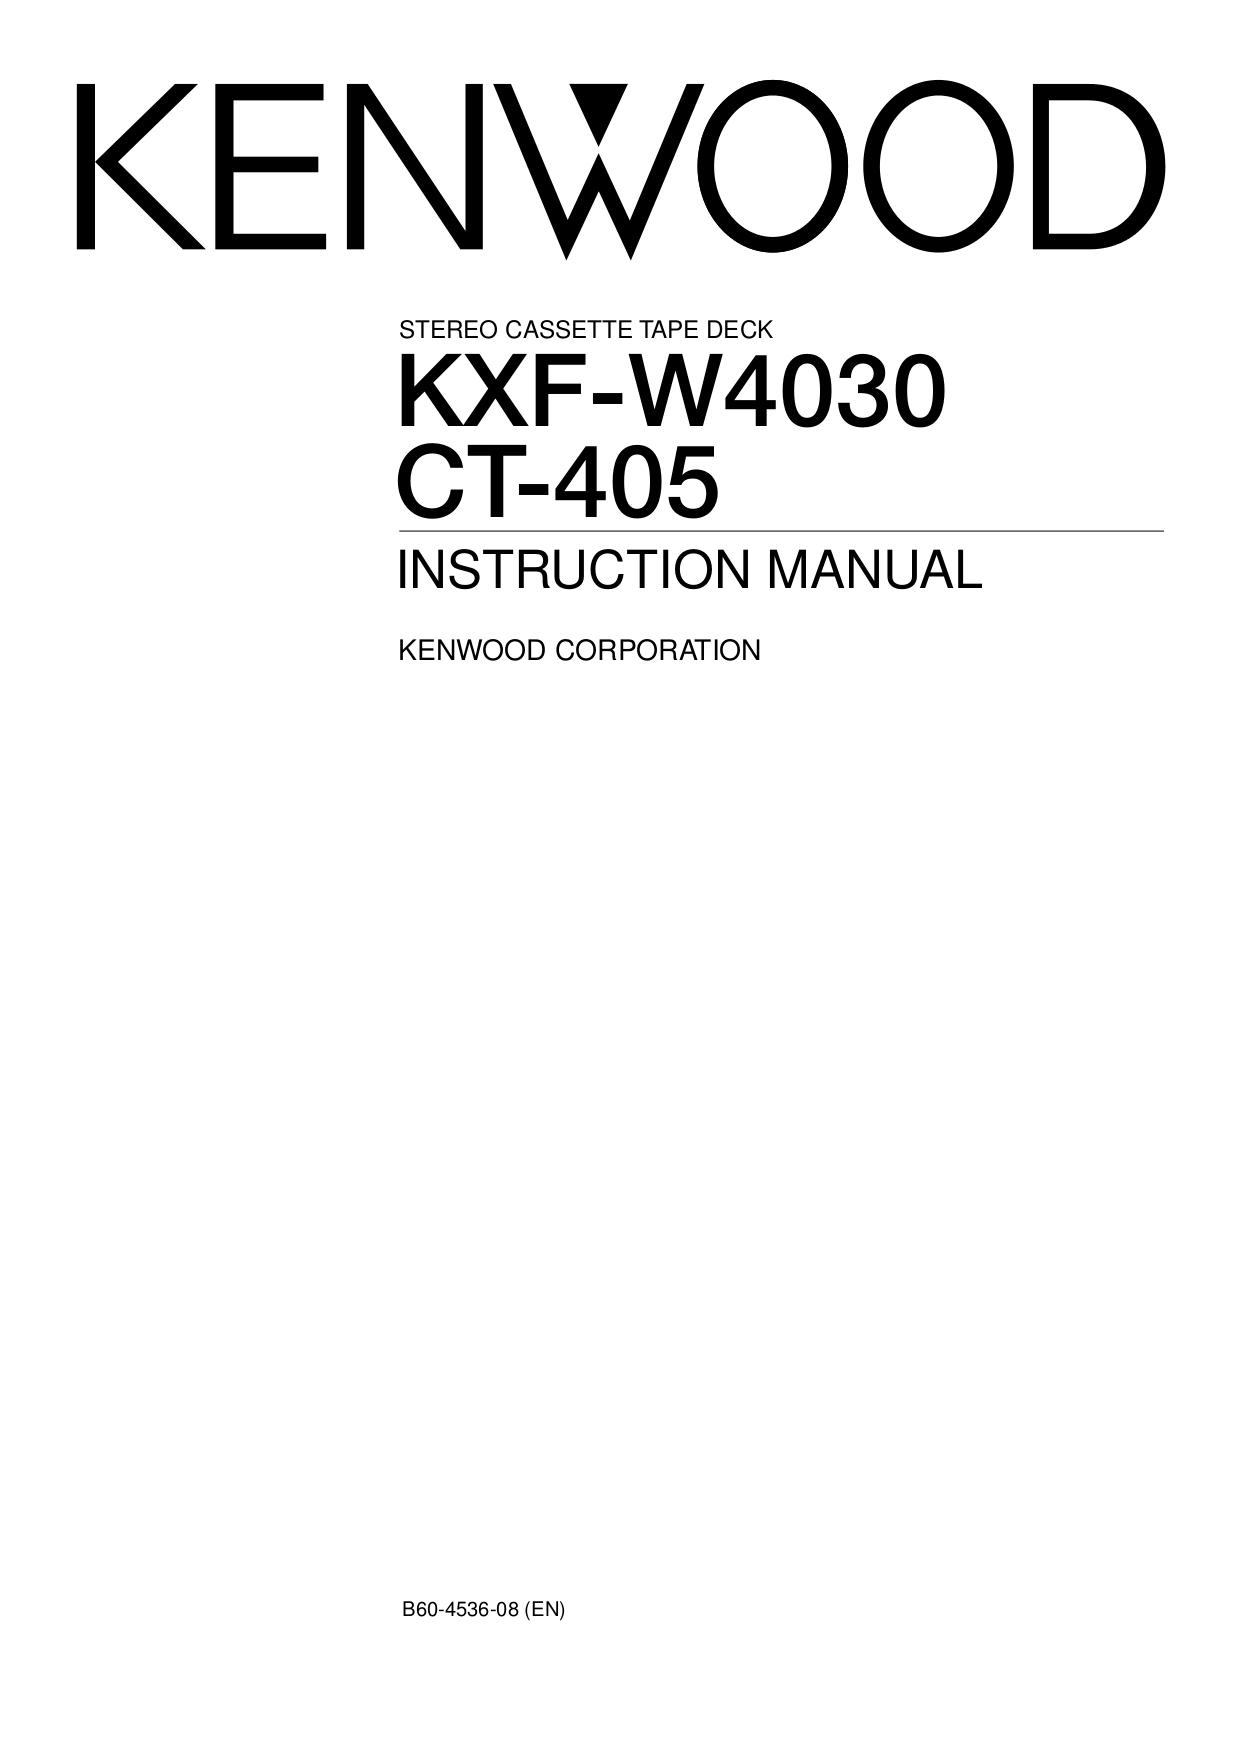 Download Free For Kenwood Ct 201 Tape Deck Manual